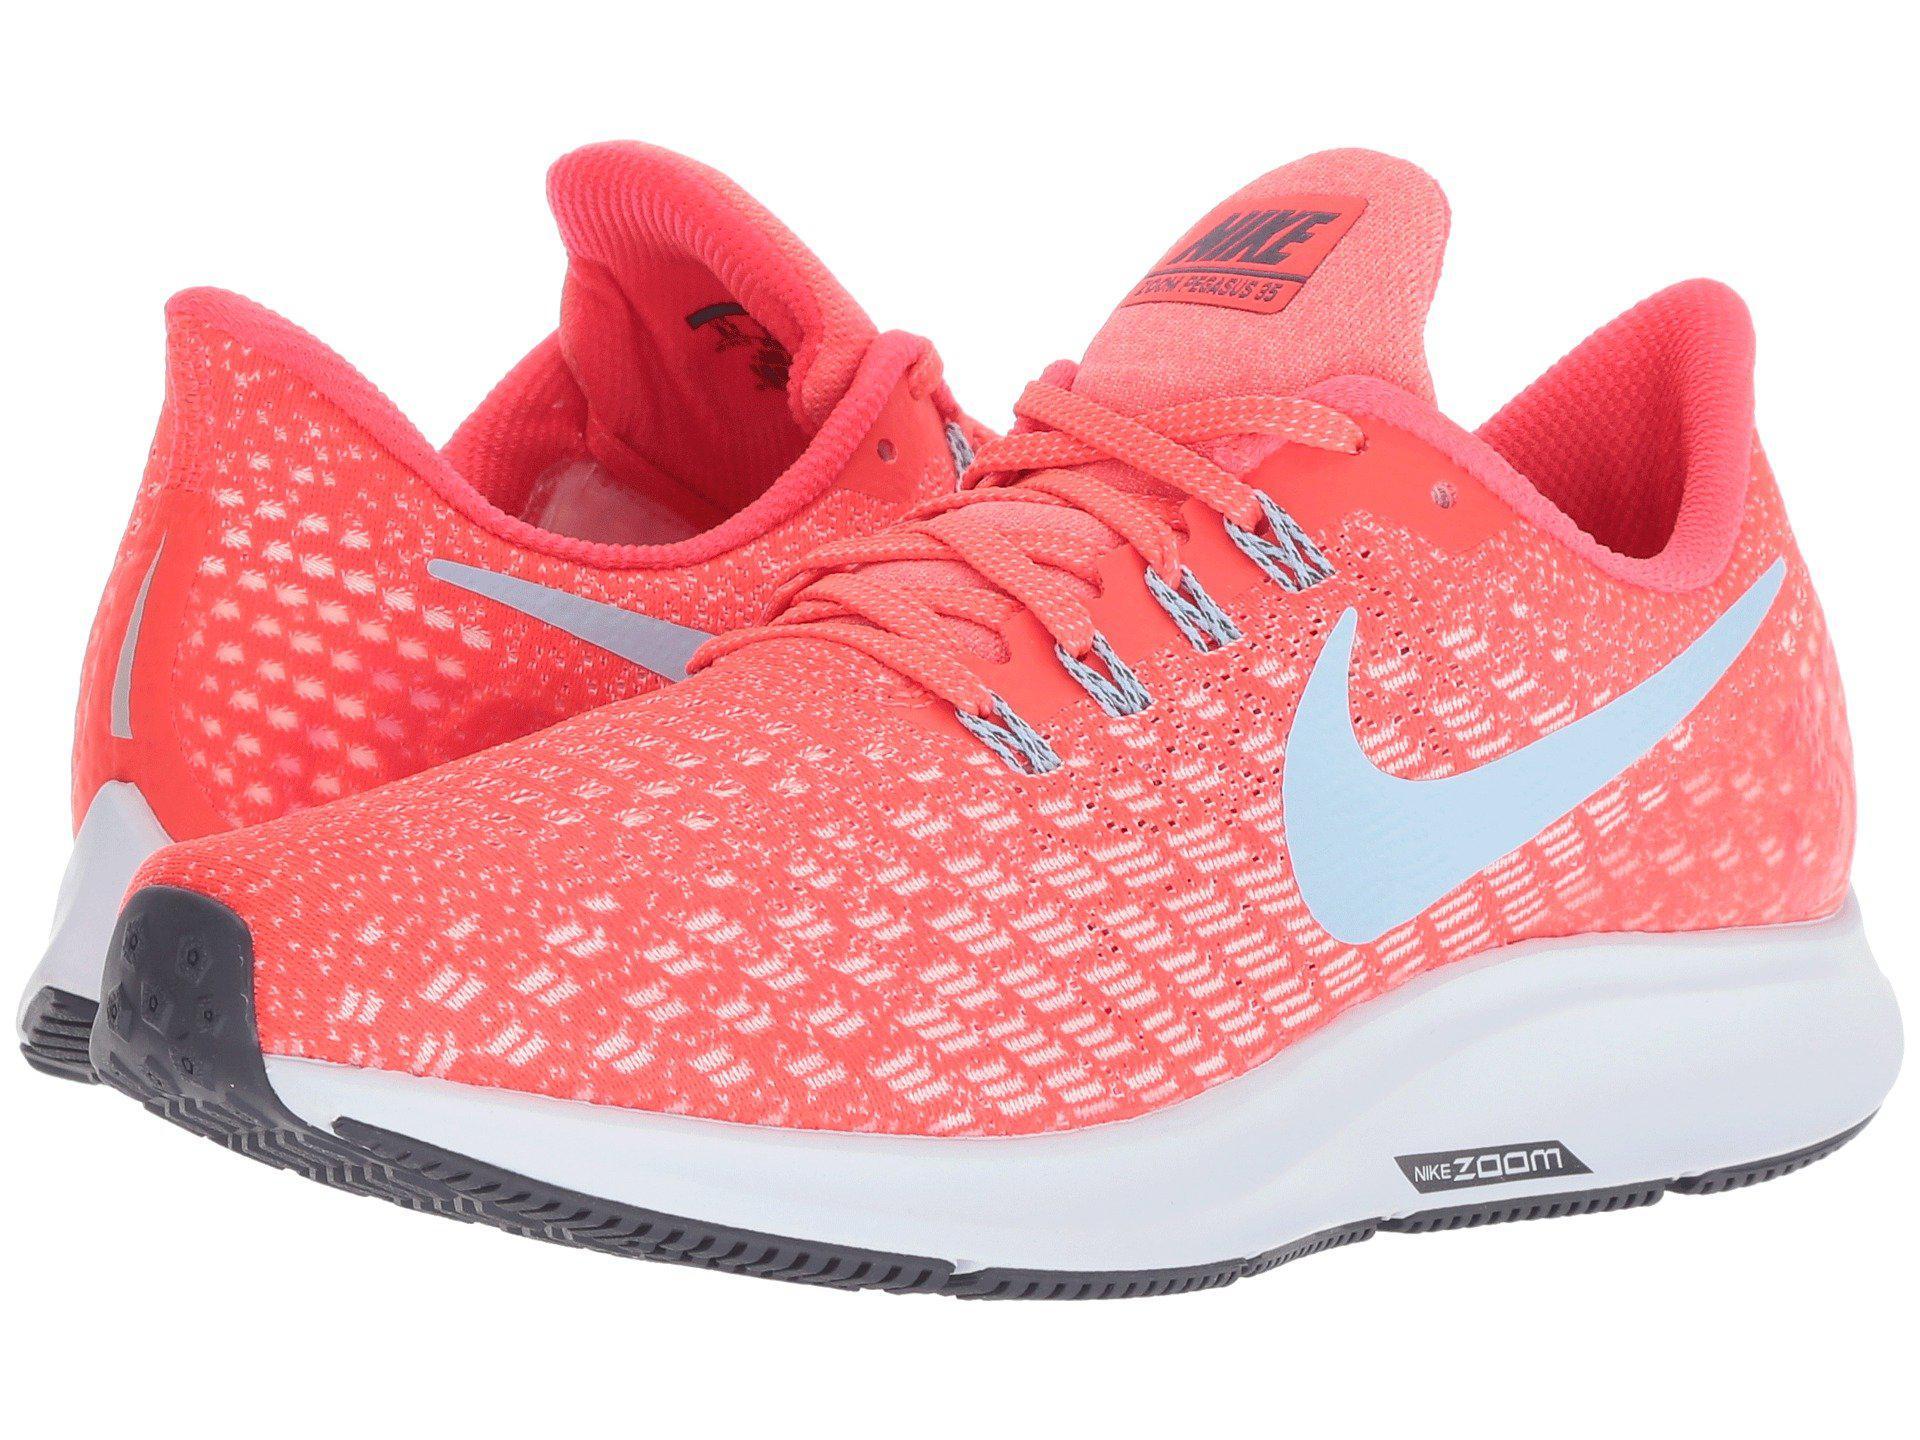 d72cac427254 Lyst - Nike Air Zoom Pegasus 35 in Red - Save 7%